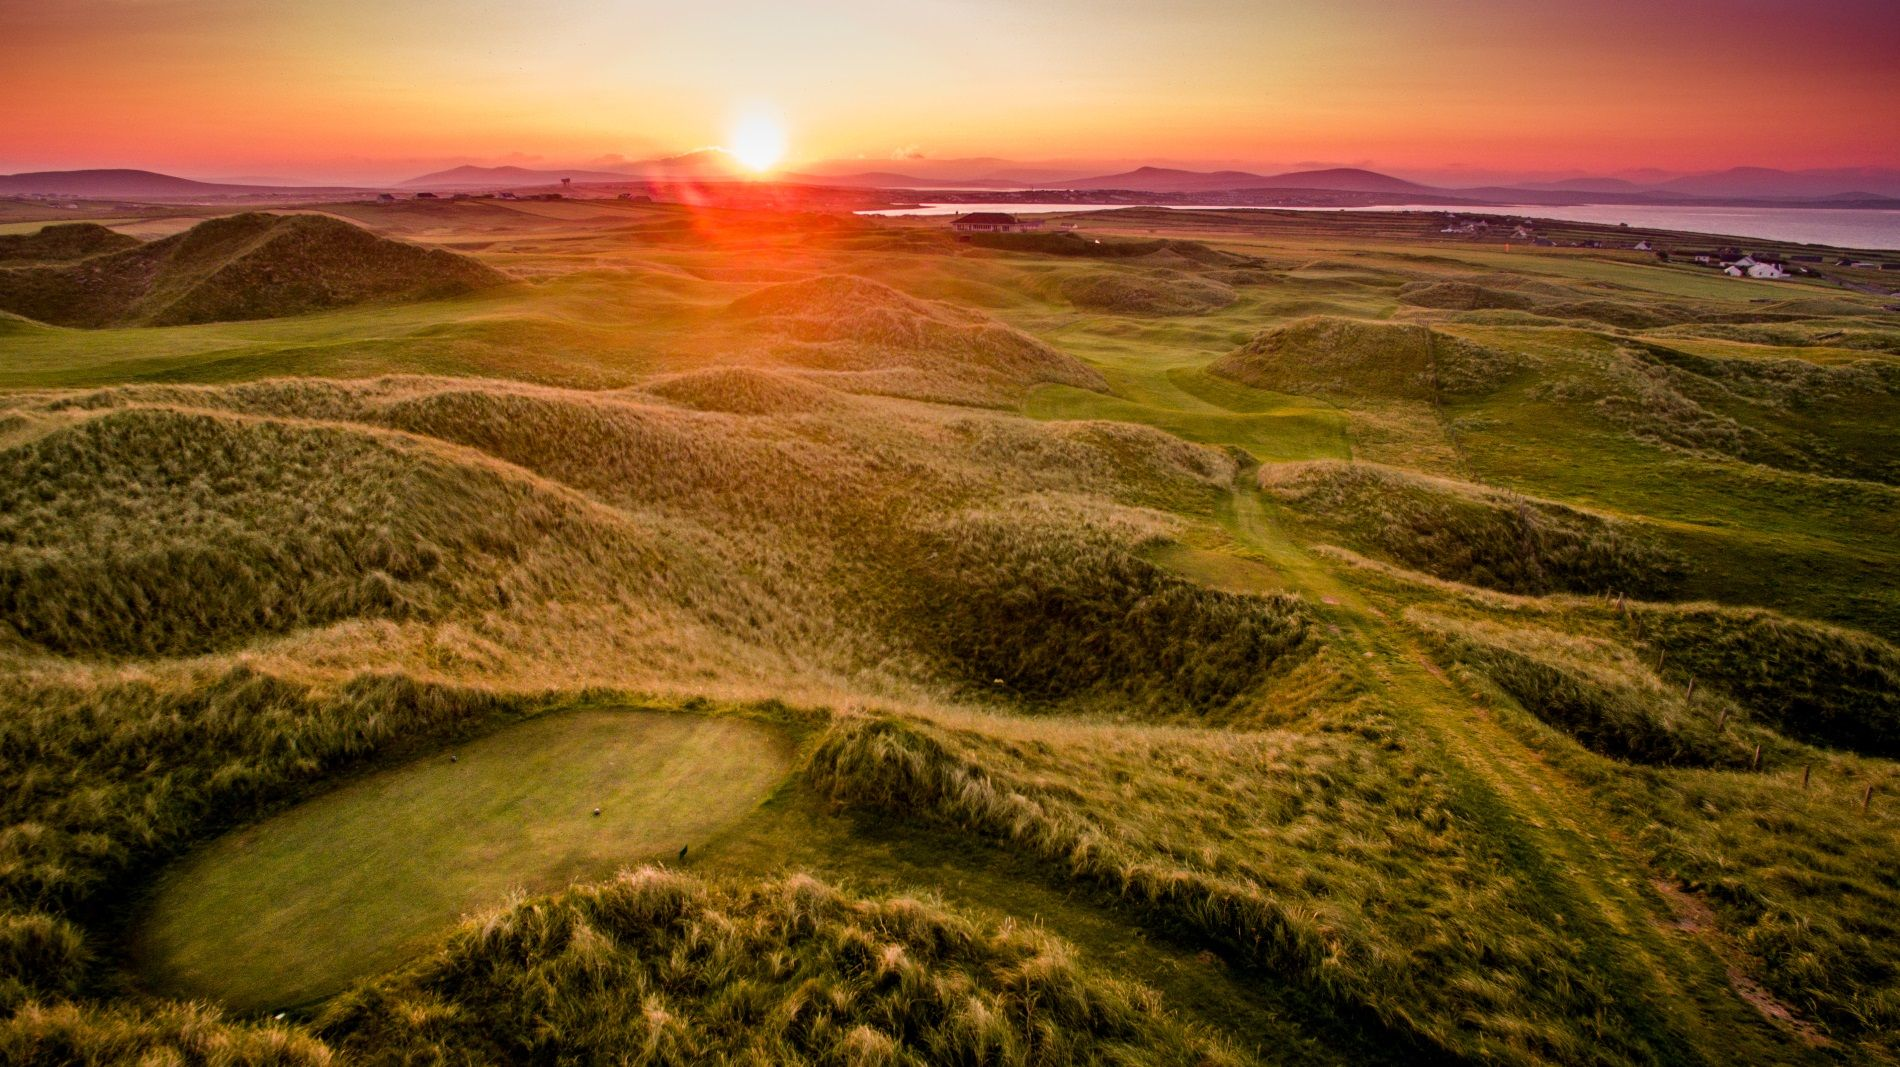 Carne Golf Links | Carne Golf Links | Pinterest | Golf and Ireland